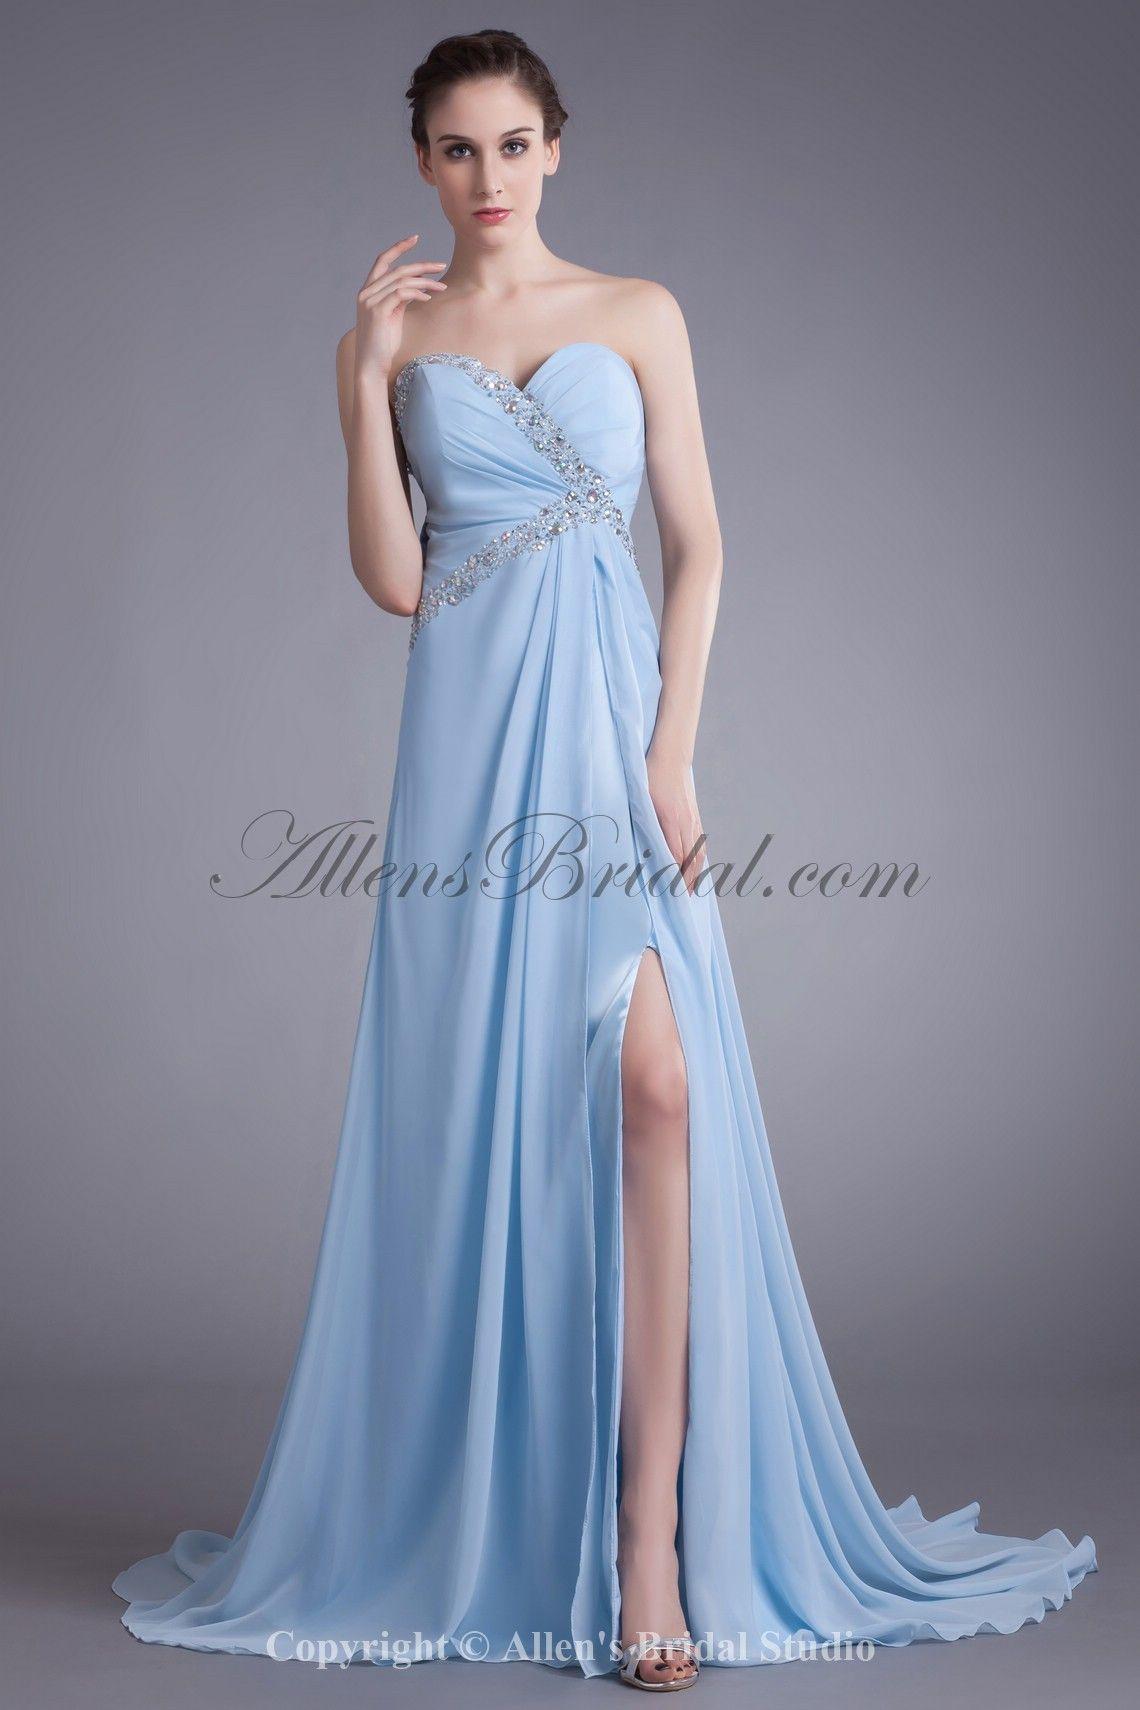 Fantastic 80s Prom Dresses For Sale Embellishment - All Wedding ...